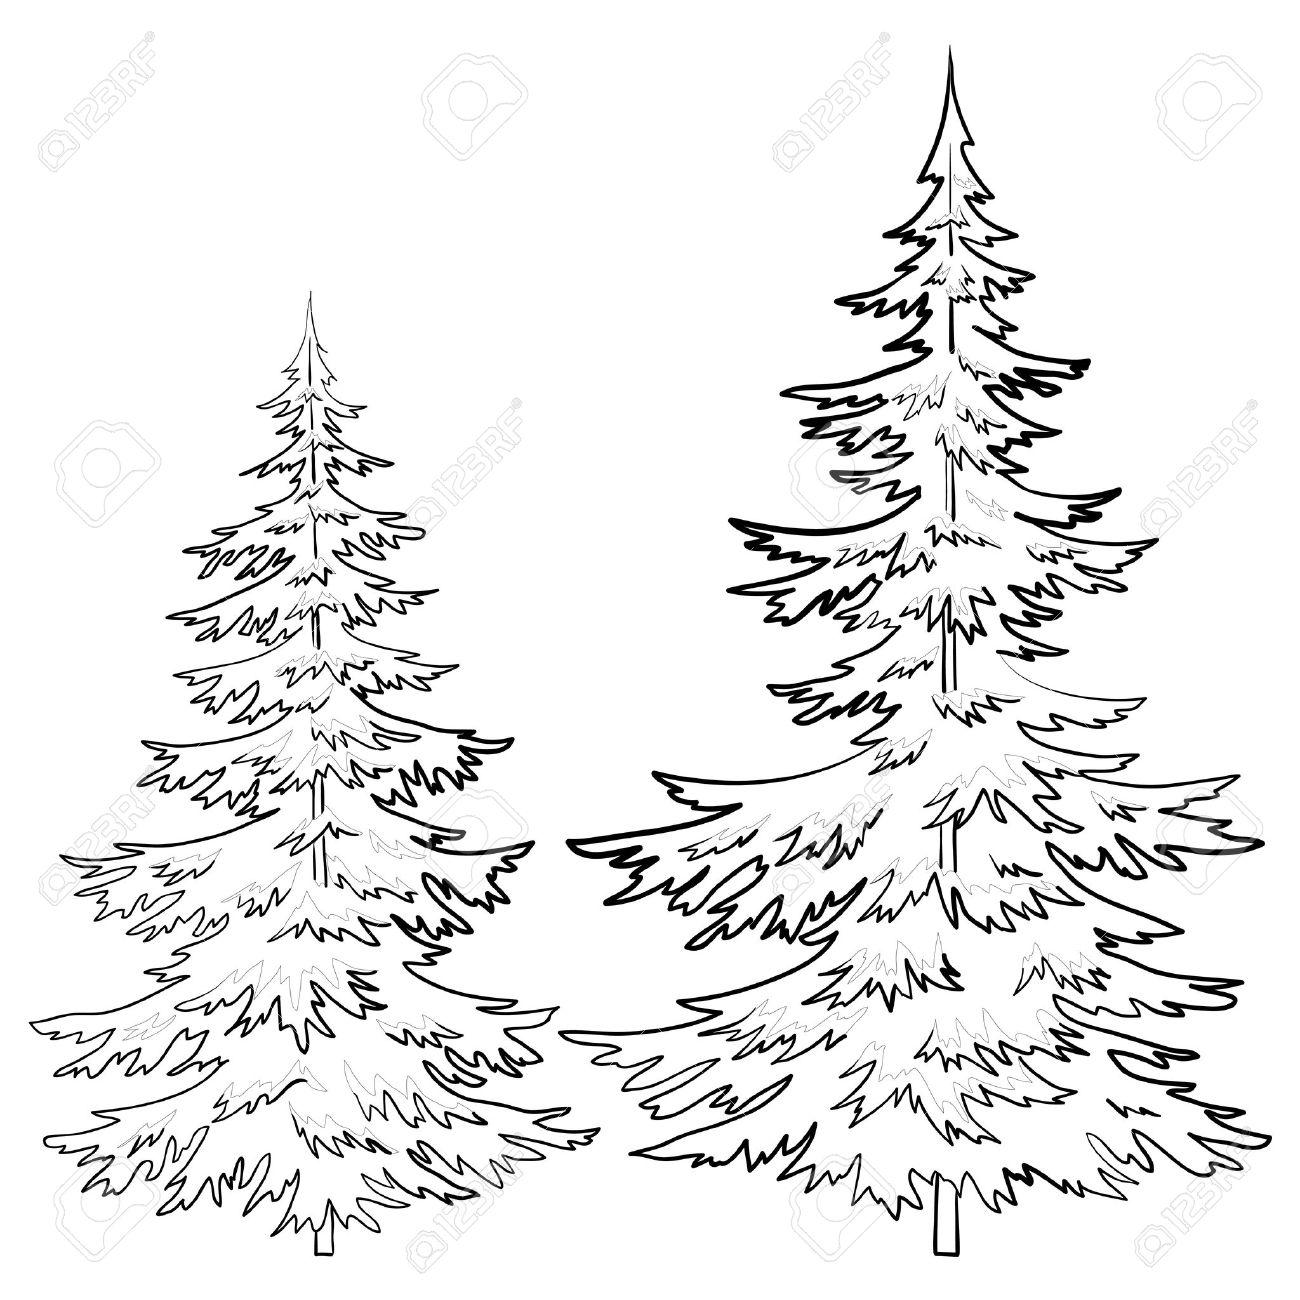 1300x1300 Christms How To Draw A Realistic Pine Tree S U Qvccom Pinting